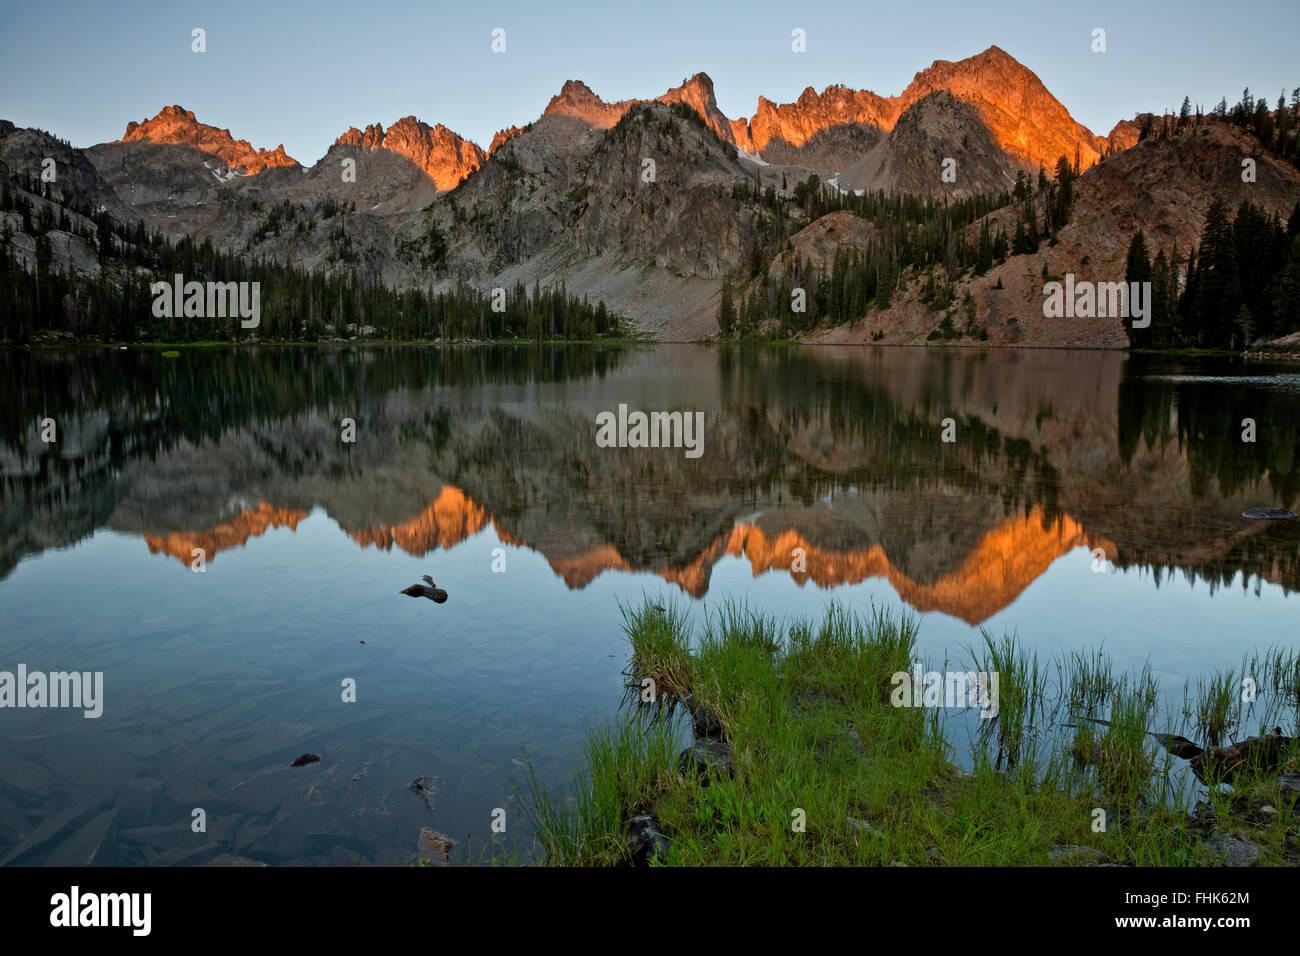 ID00441-00...IDAHO - Sunrise at Alice Lake in the Sawtooth Wilderness Area. - Stock Image